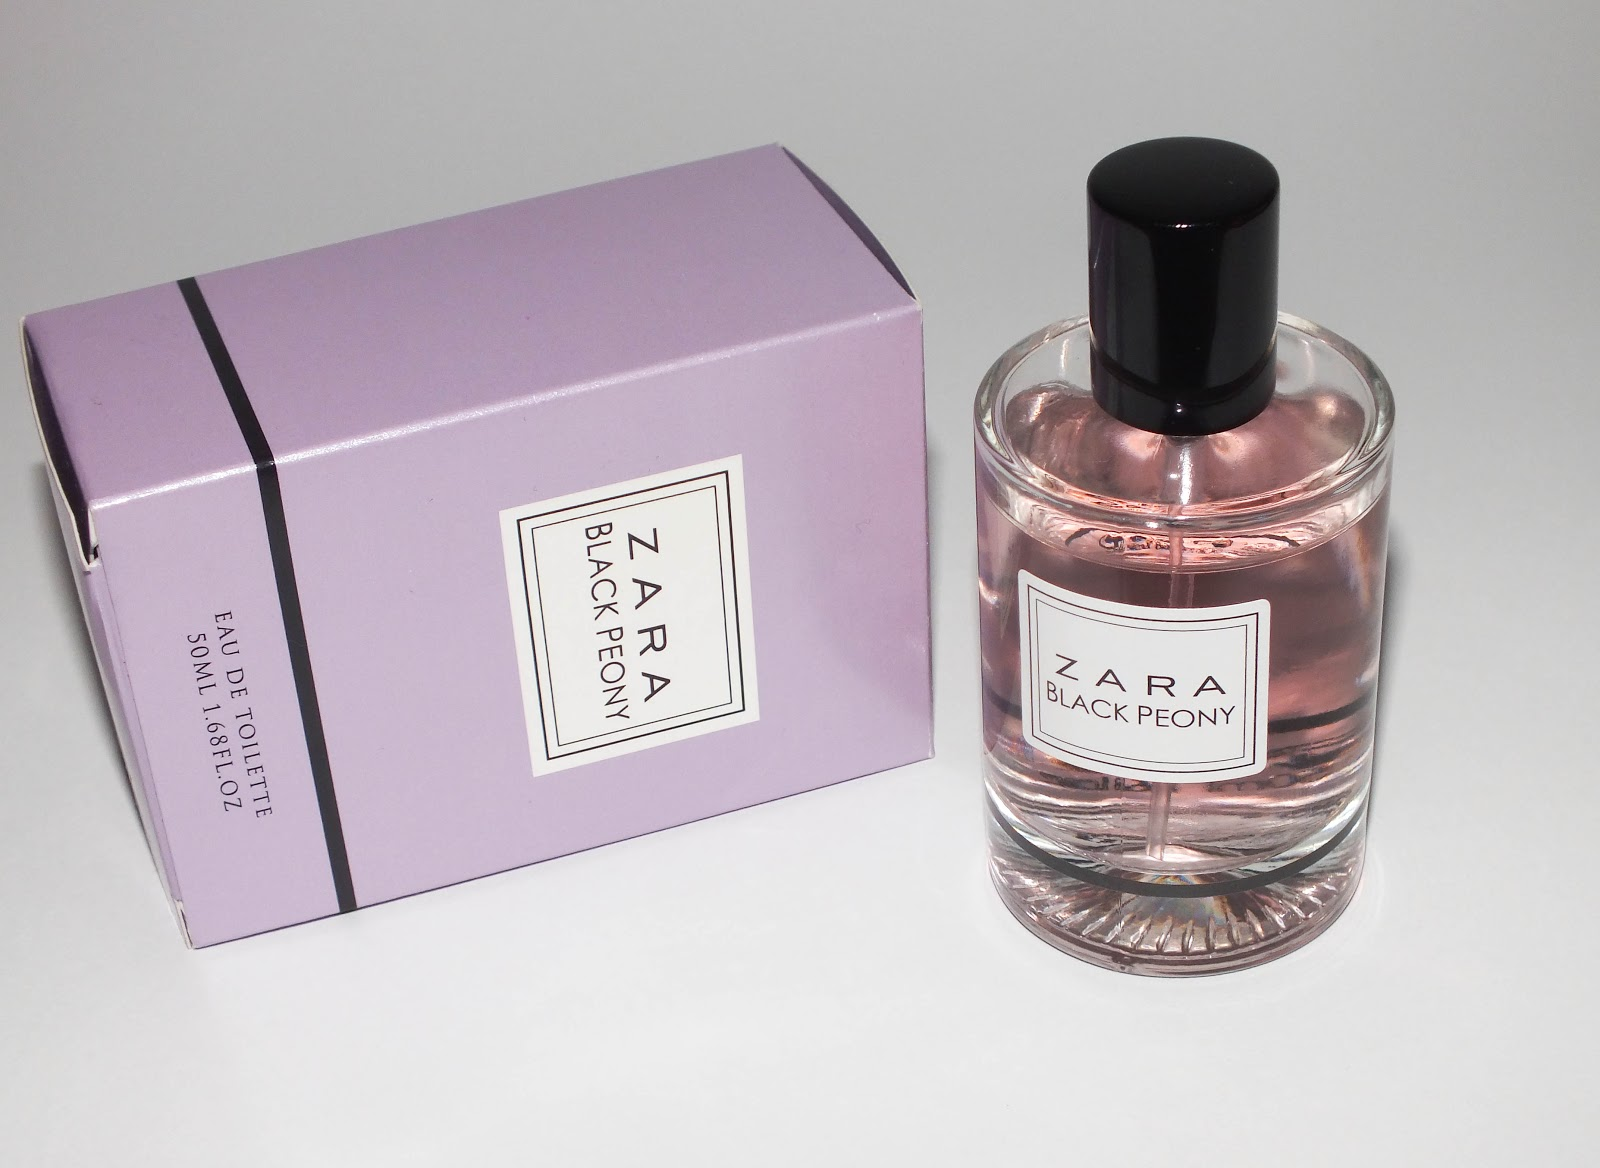 the pretty jam Black Peony by Zara the £9 99 Flower dupe